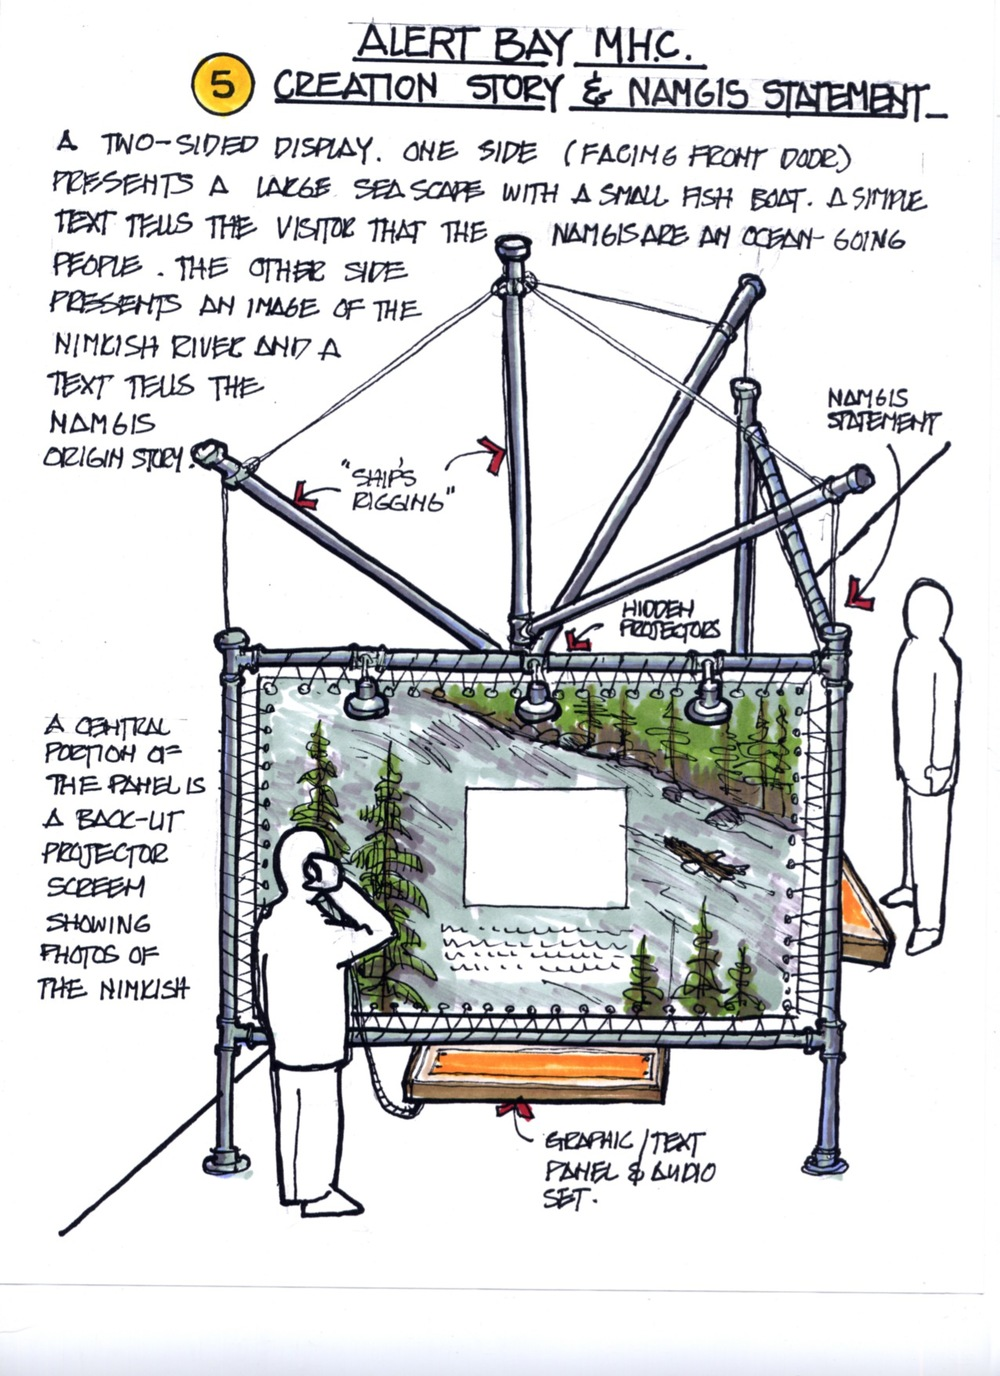 alert bay 5 creation story.jpg